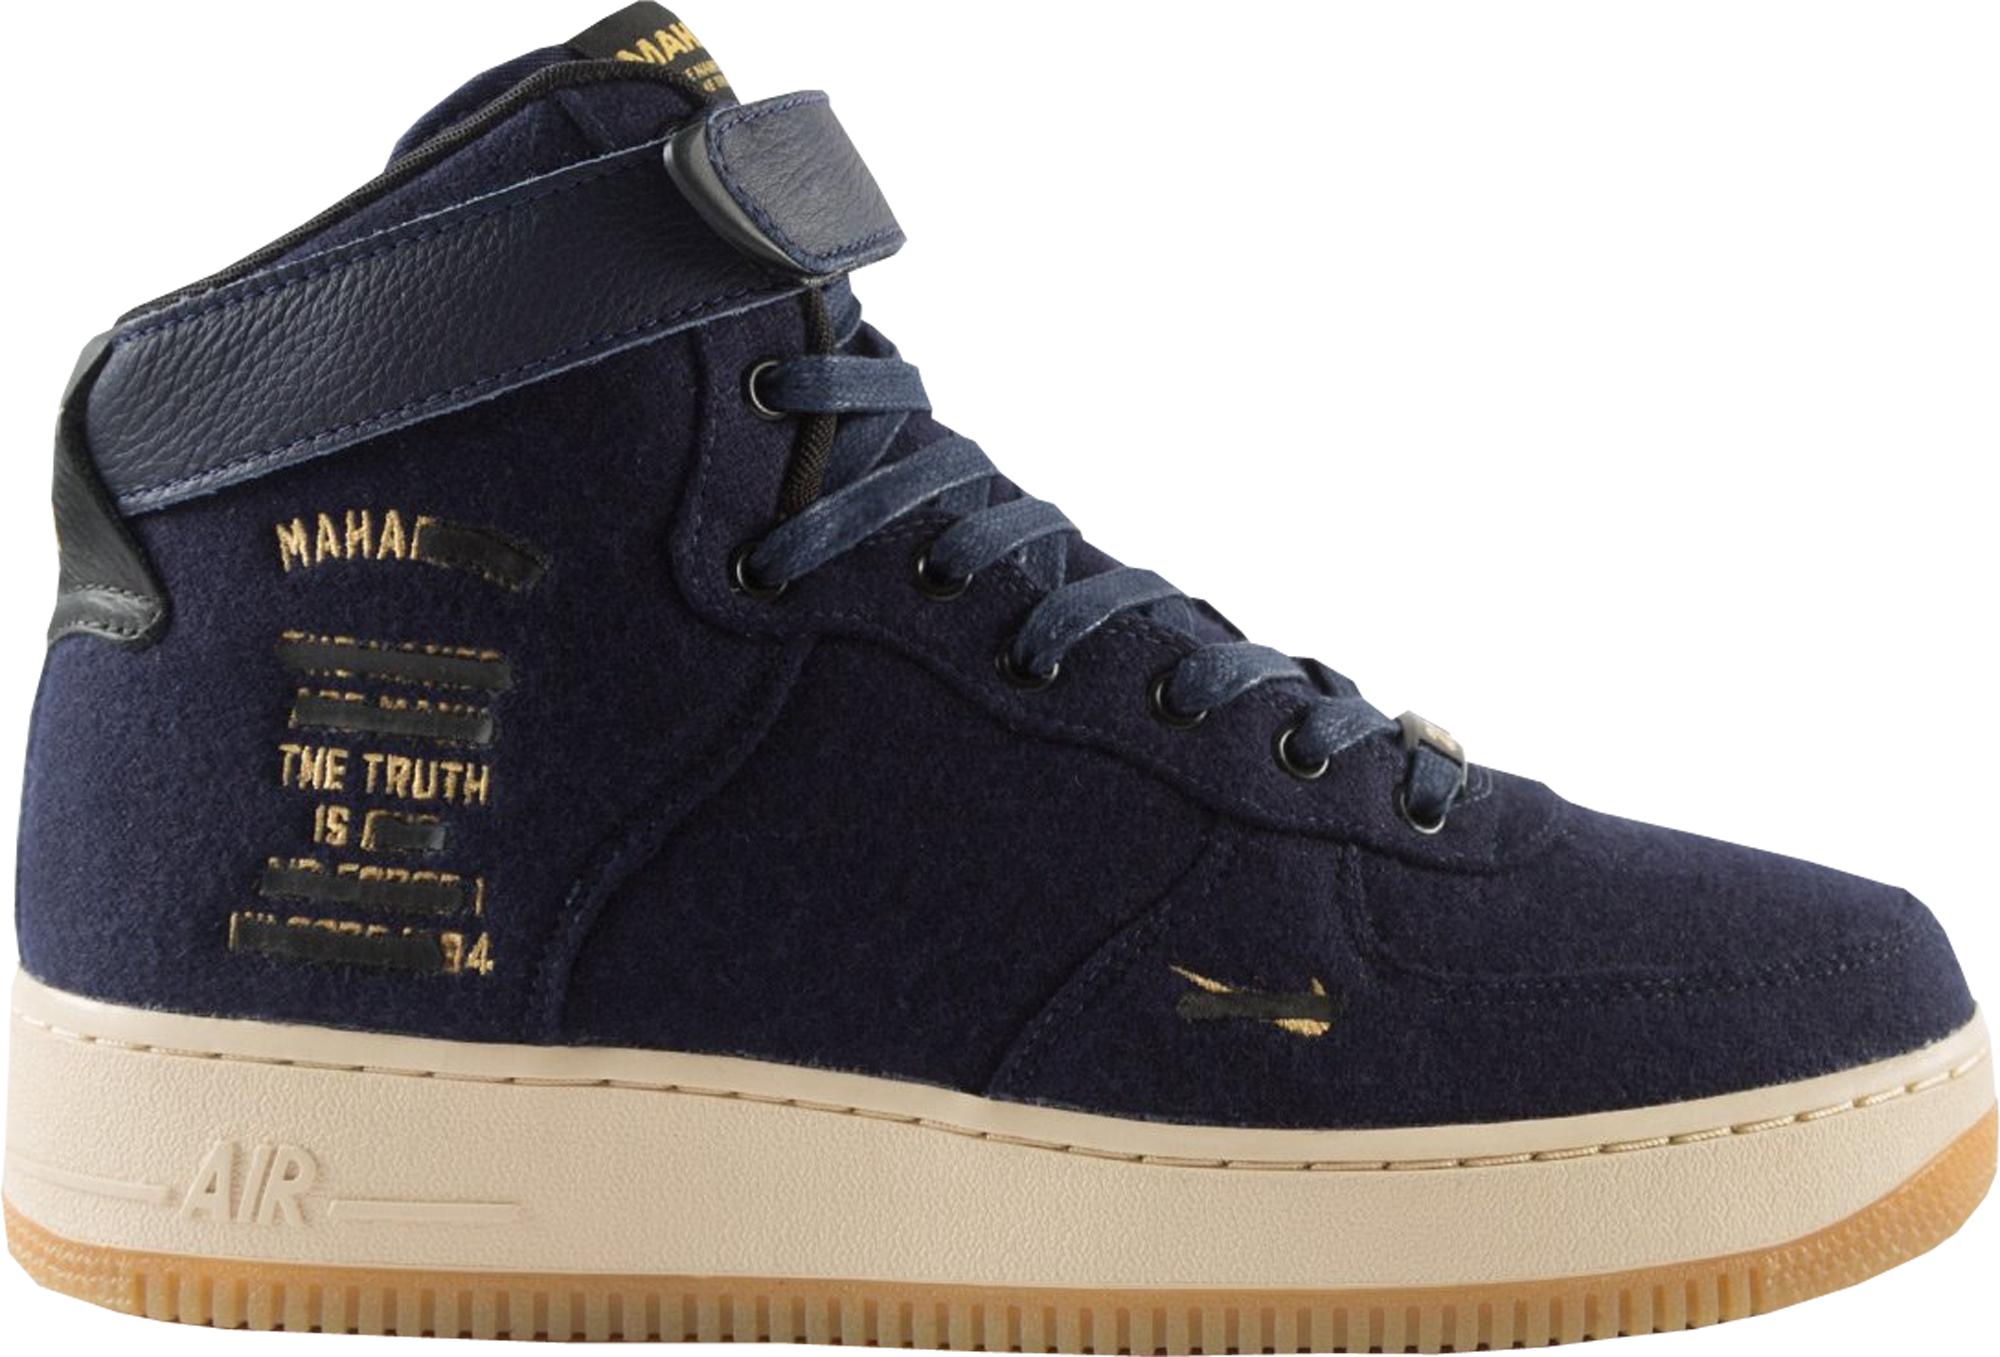 Nike Air Force 1 High maharishi Navy